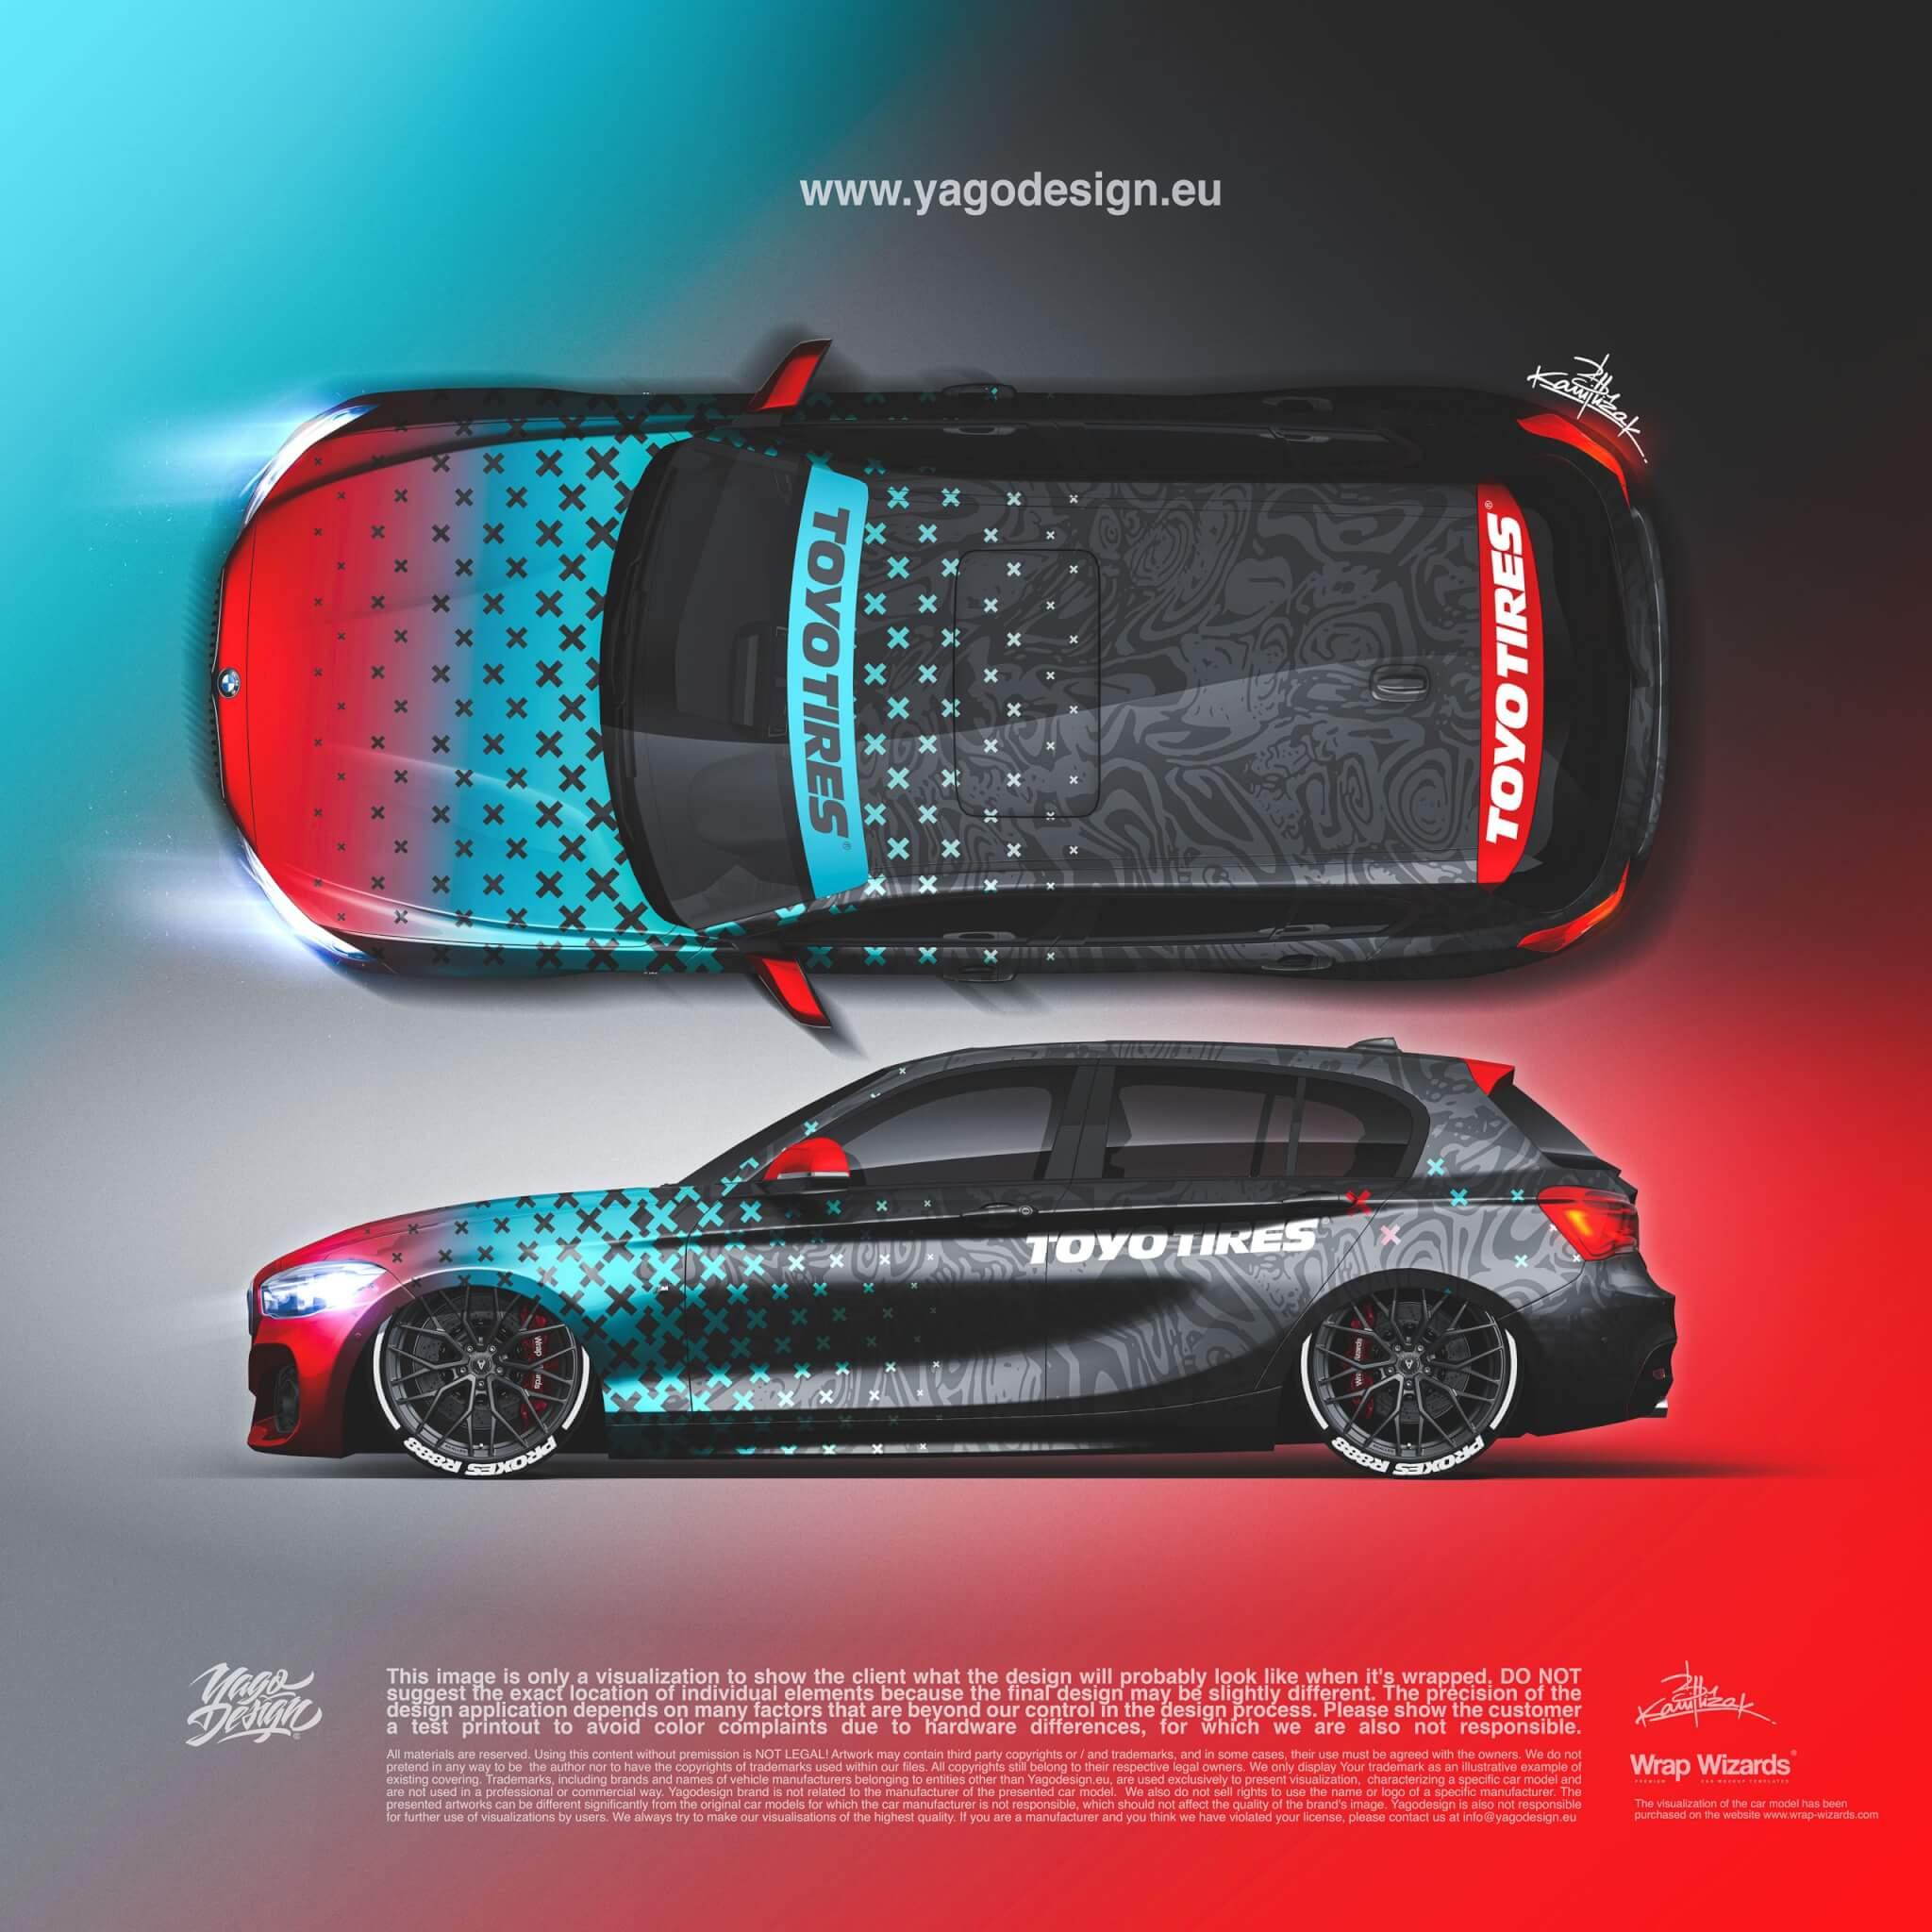 BMW-F20-SIDE&TOP-VIEW-3500-px